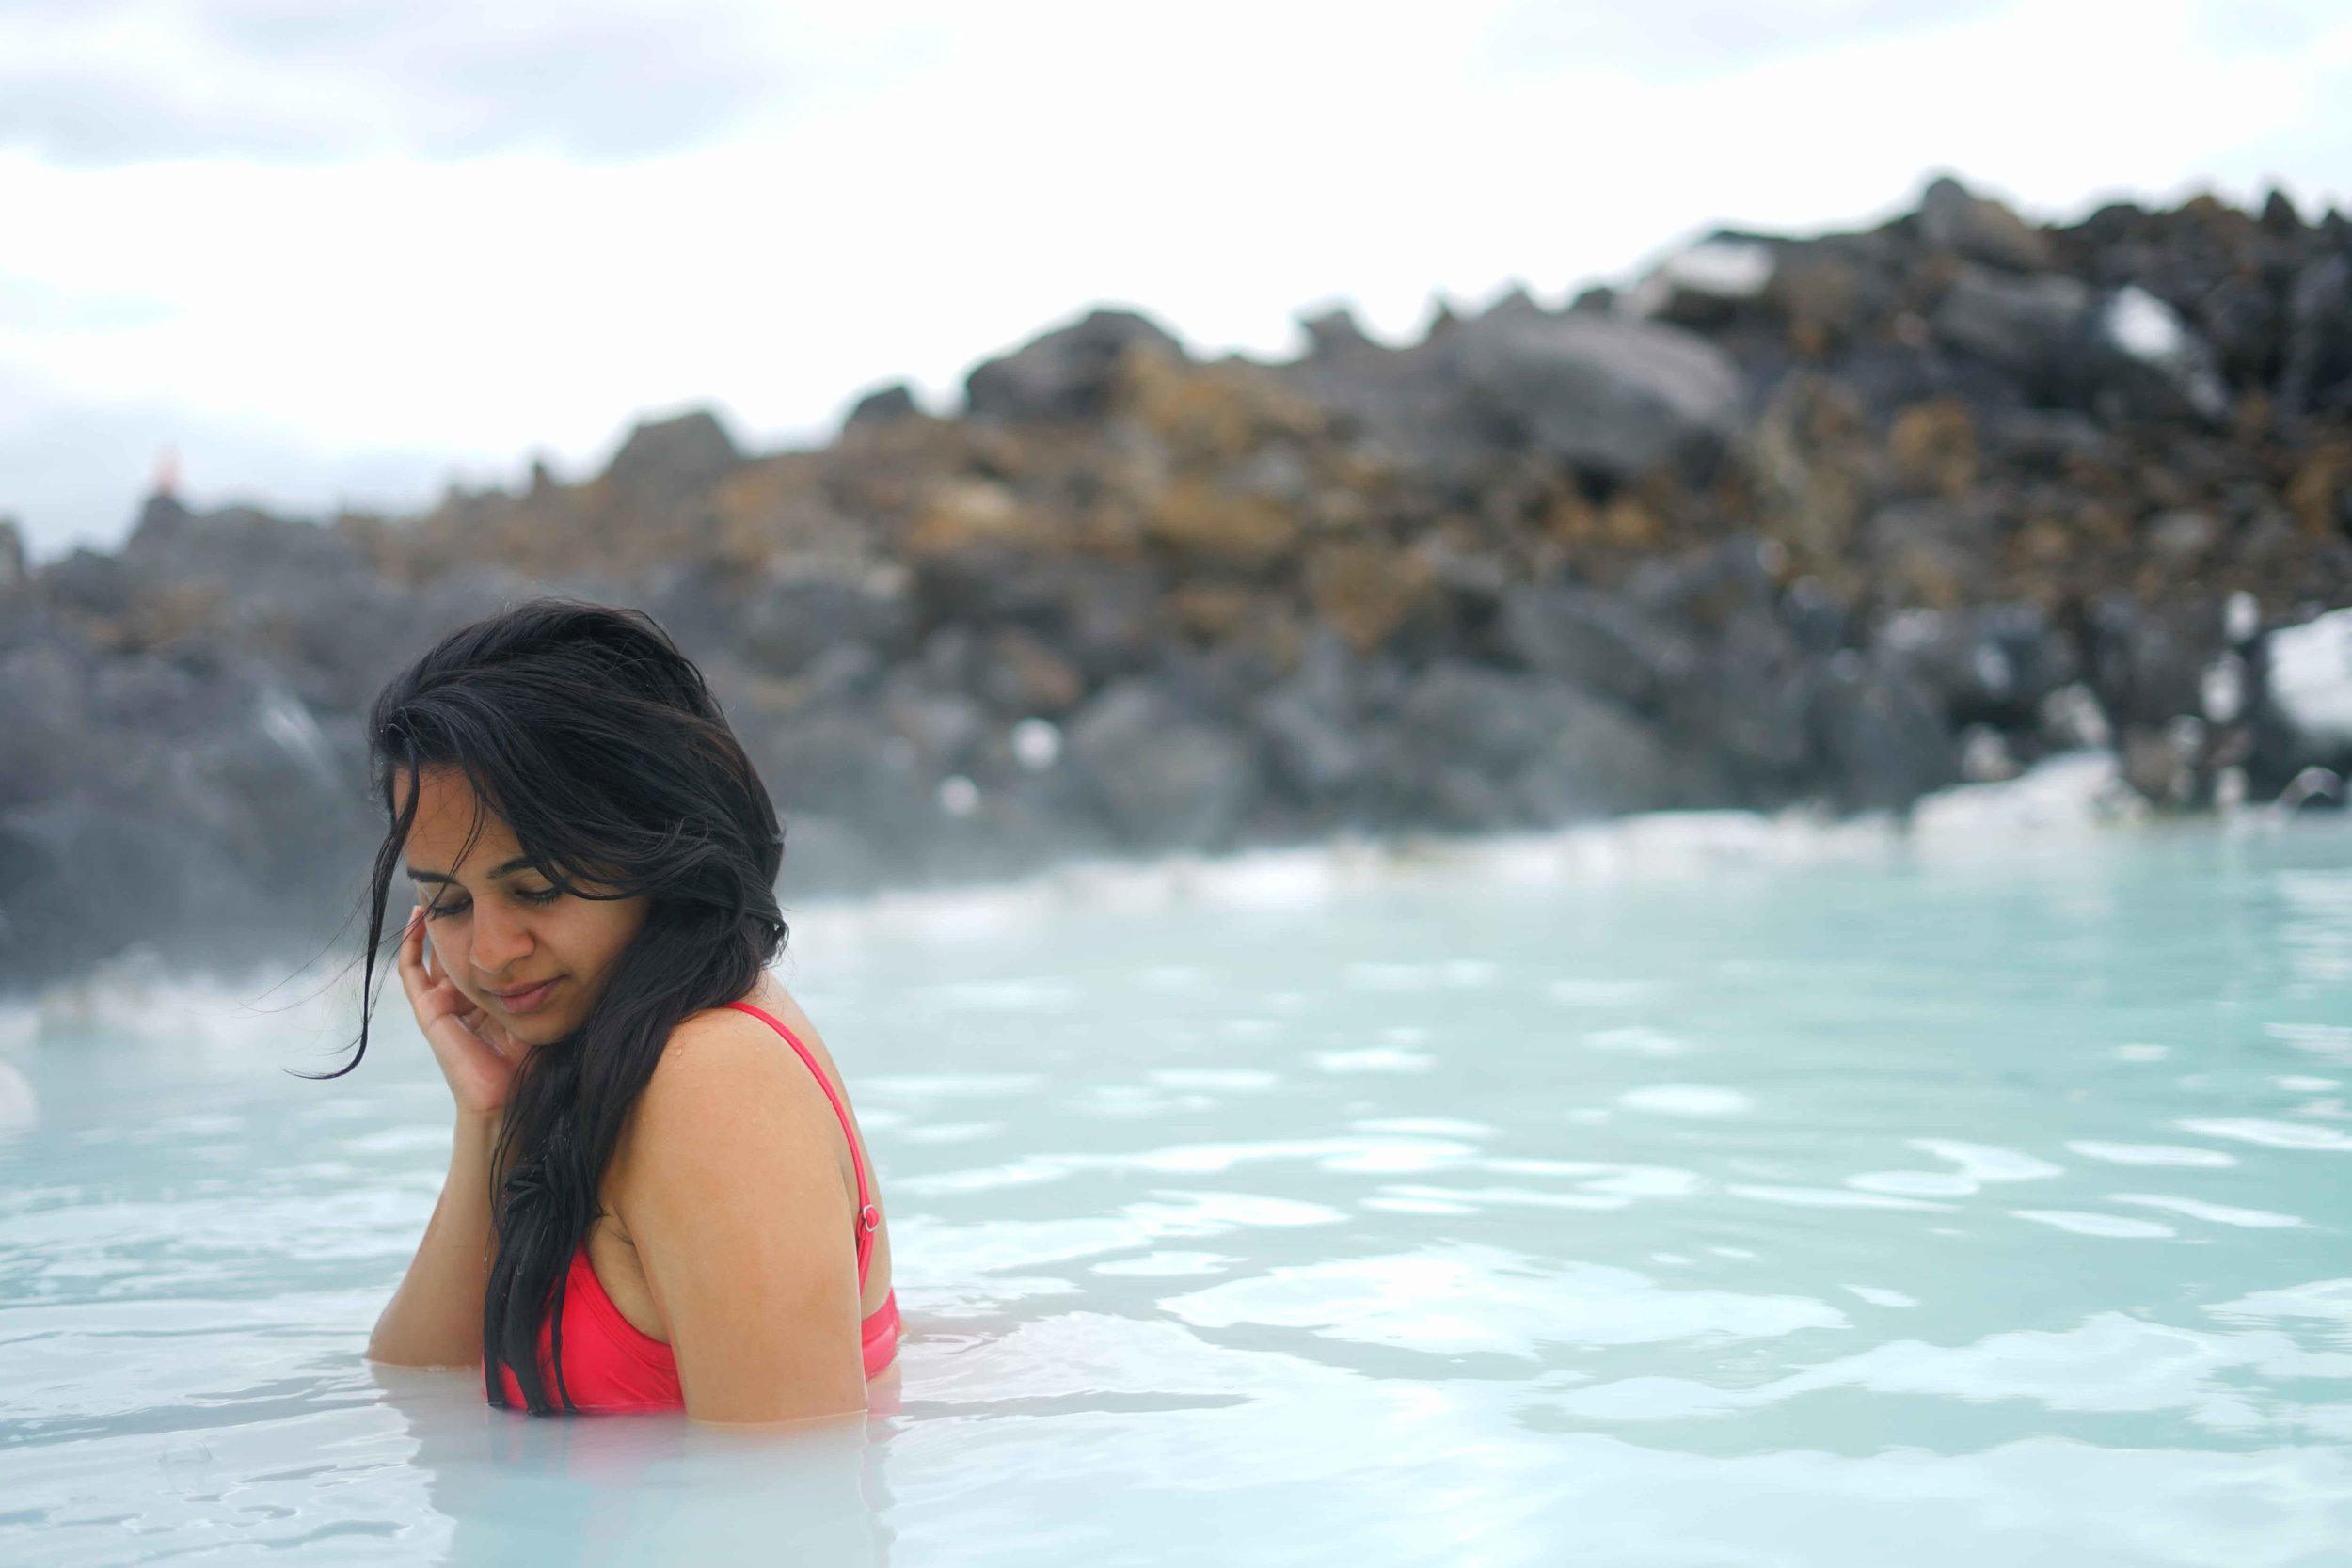 Blue Lagoon Iceland Travel Guide Charisma Shah